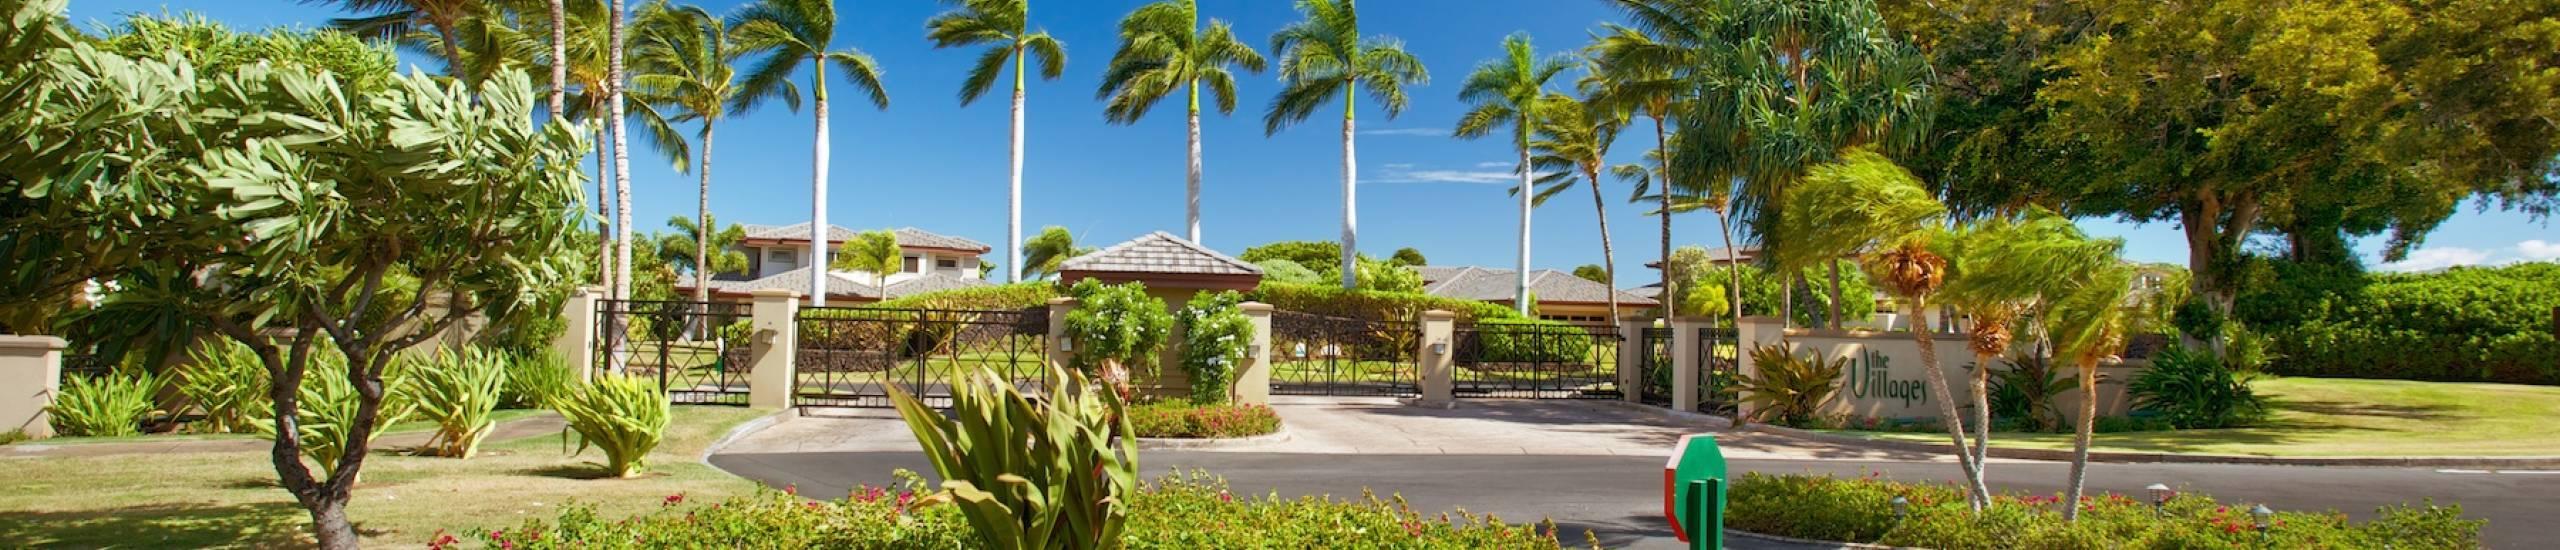 Gate entrance at the Villages at Mauna Lani